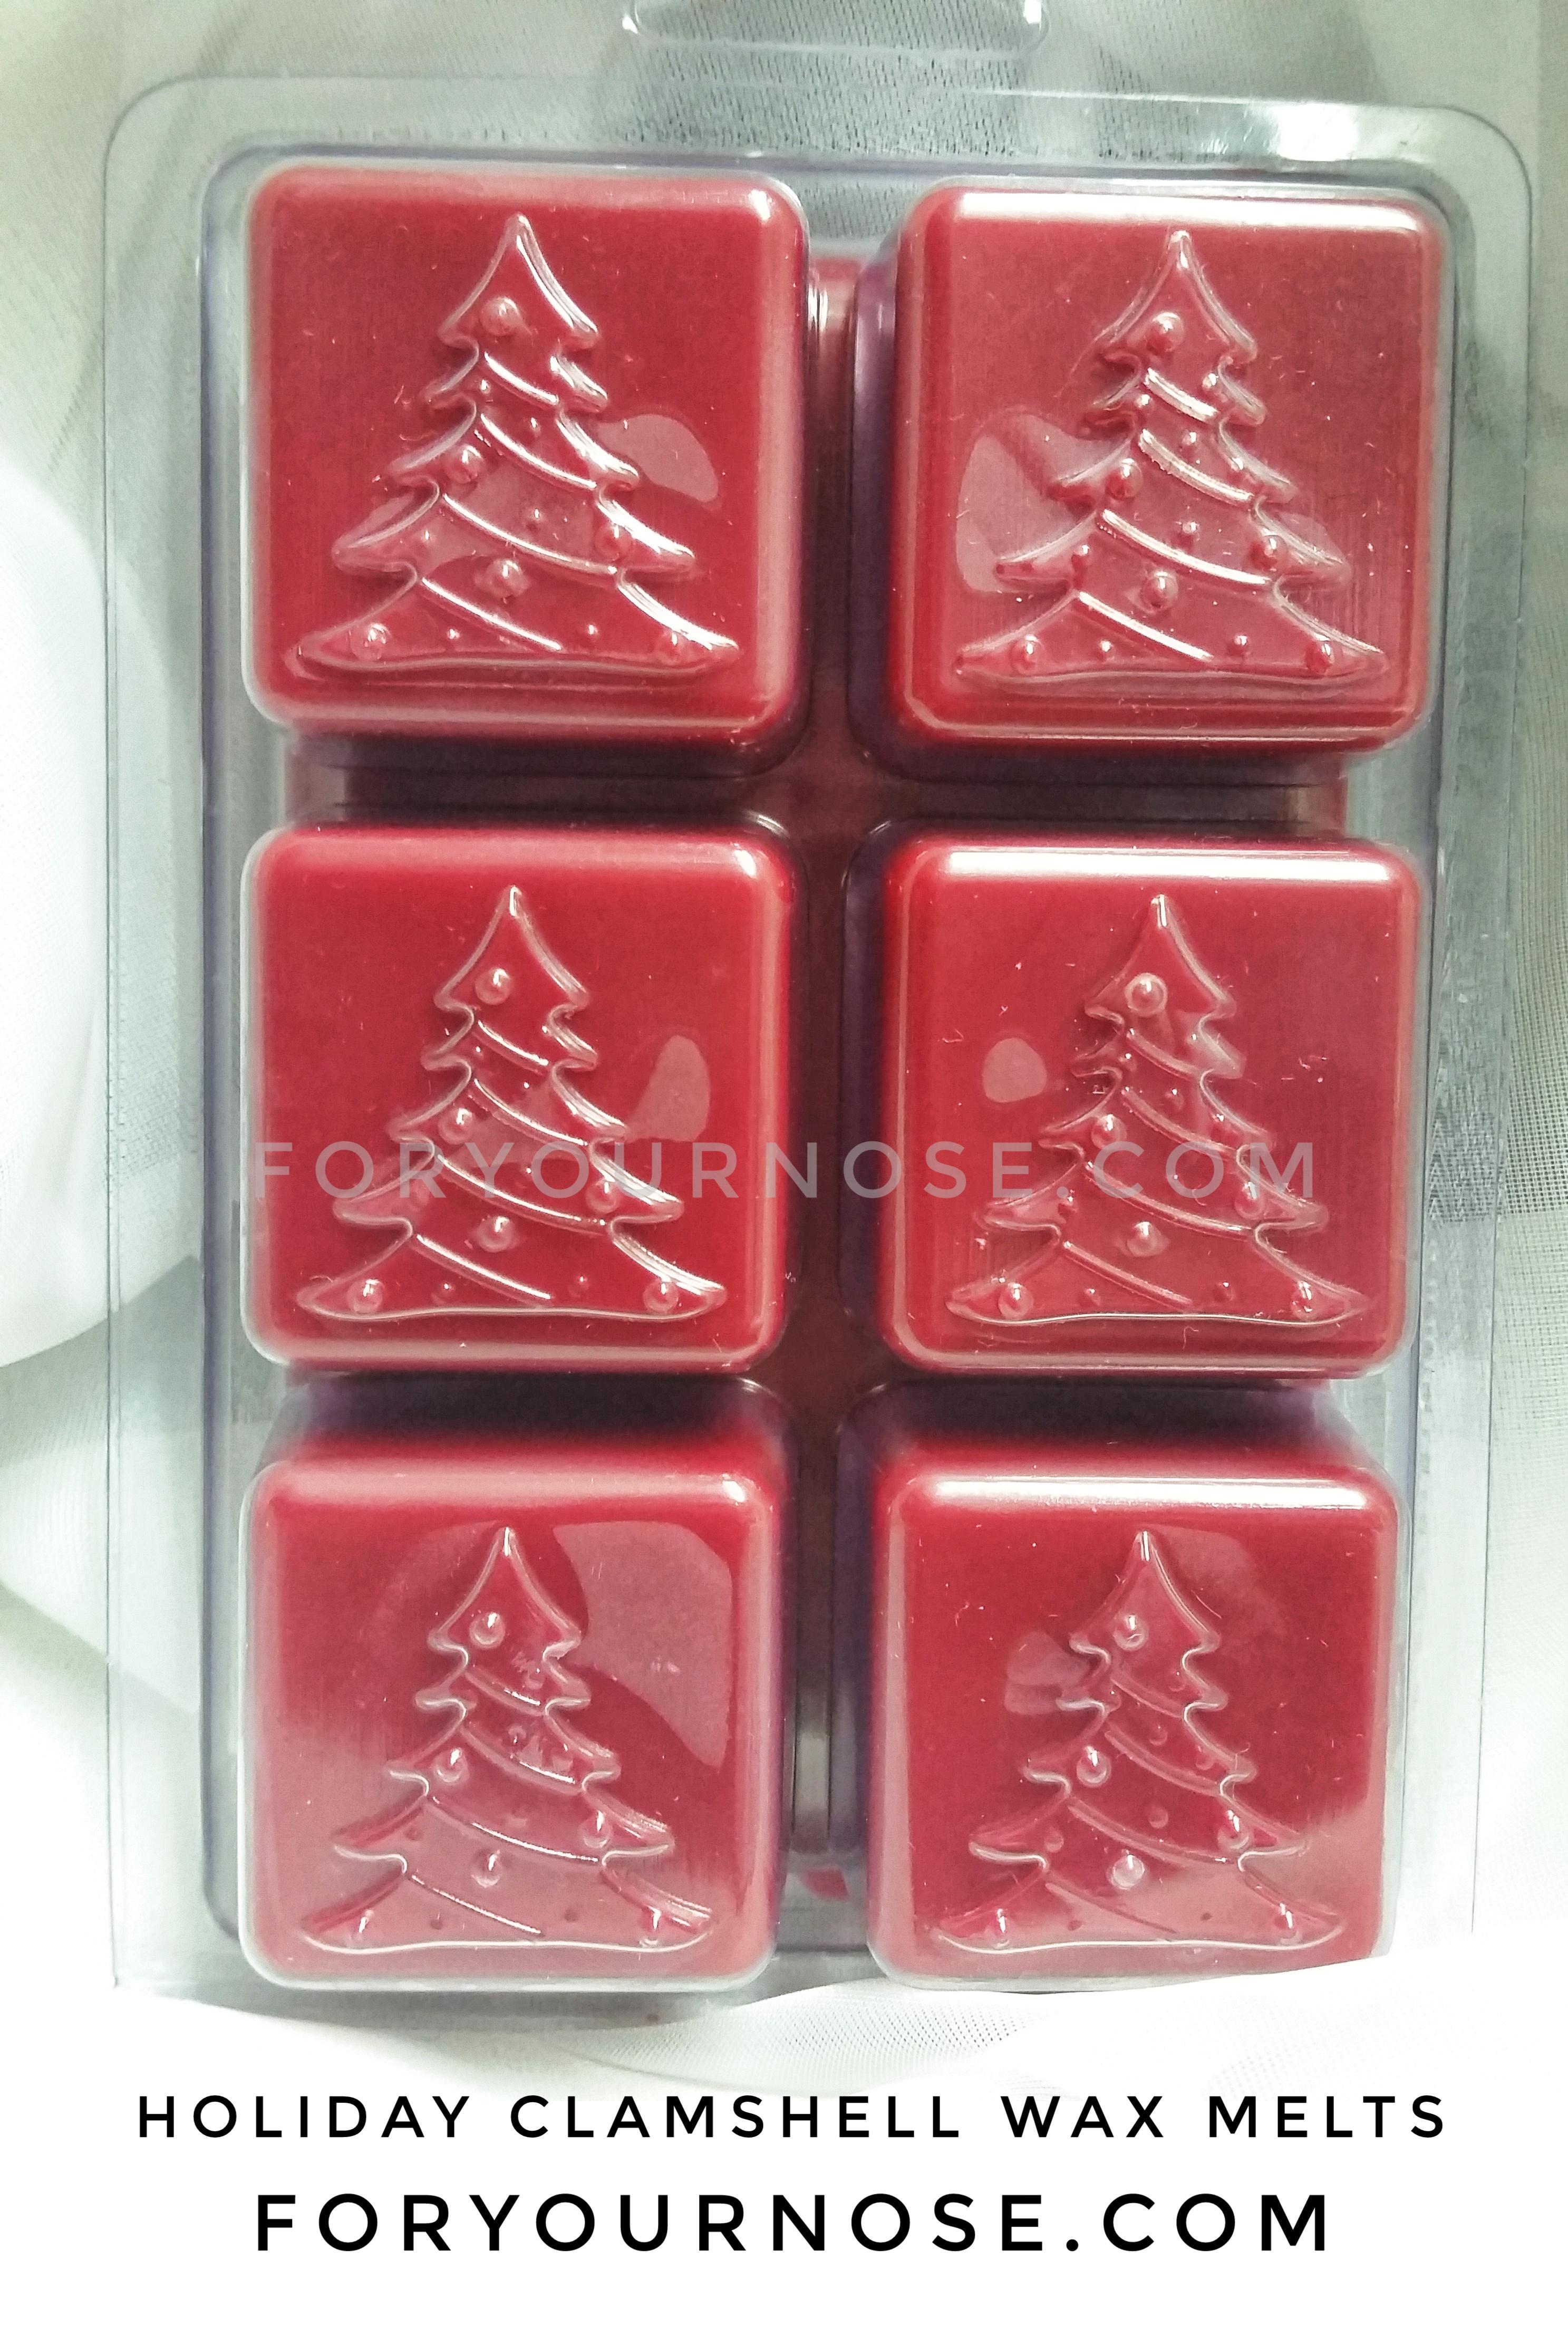 Winter Holiday Clamshell Wax Melts - 6 oz. (Custom)